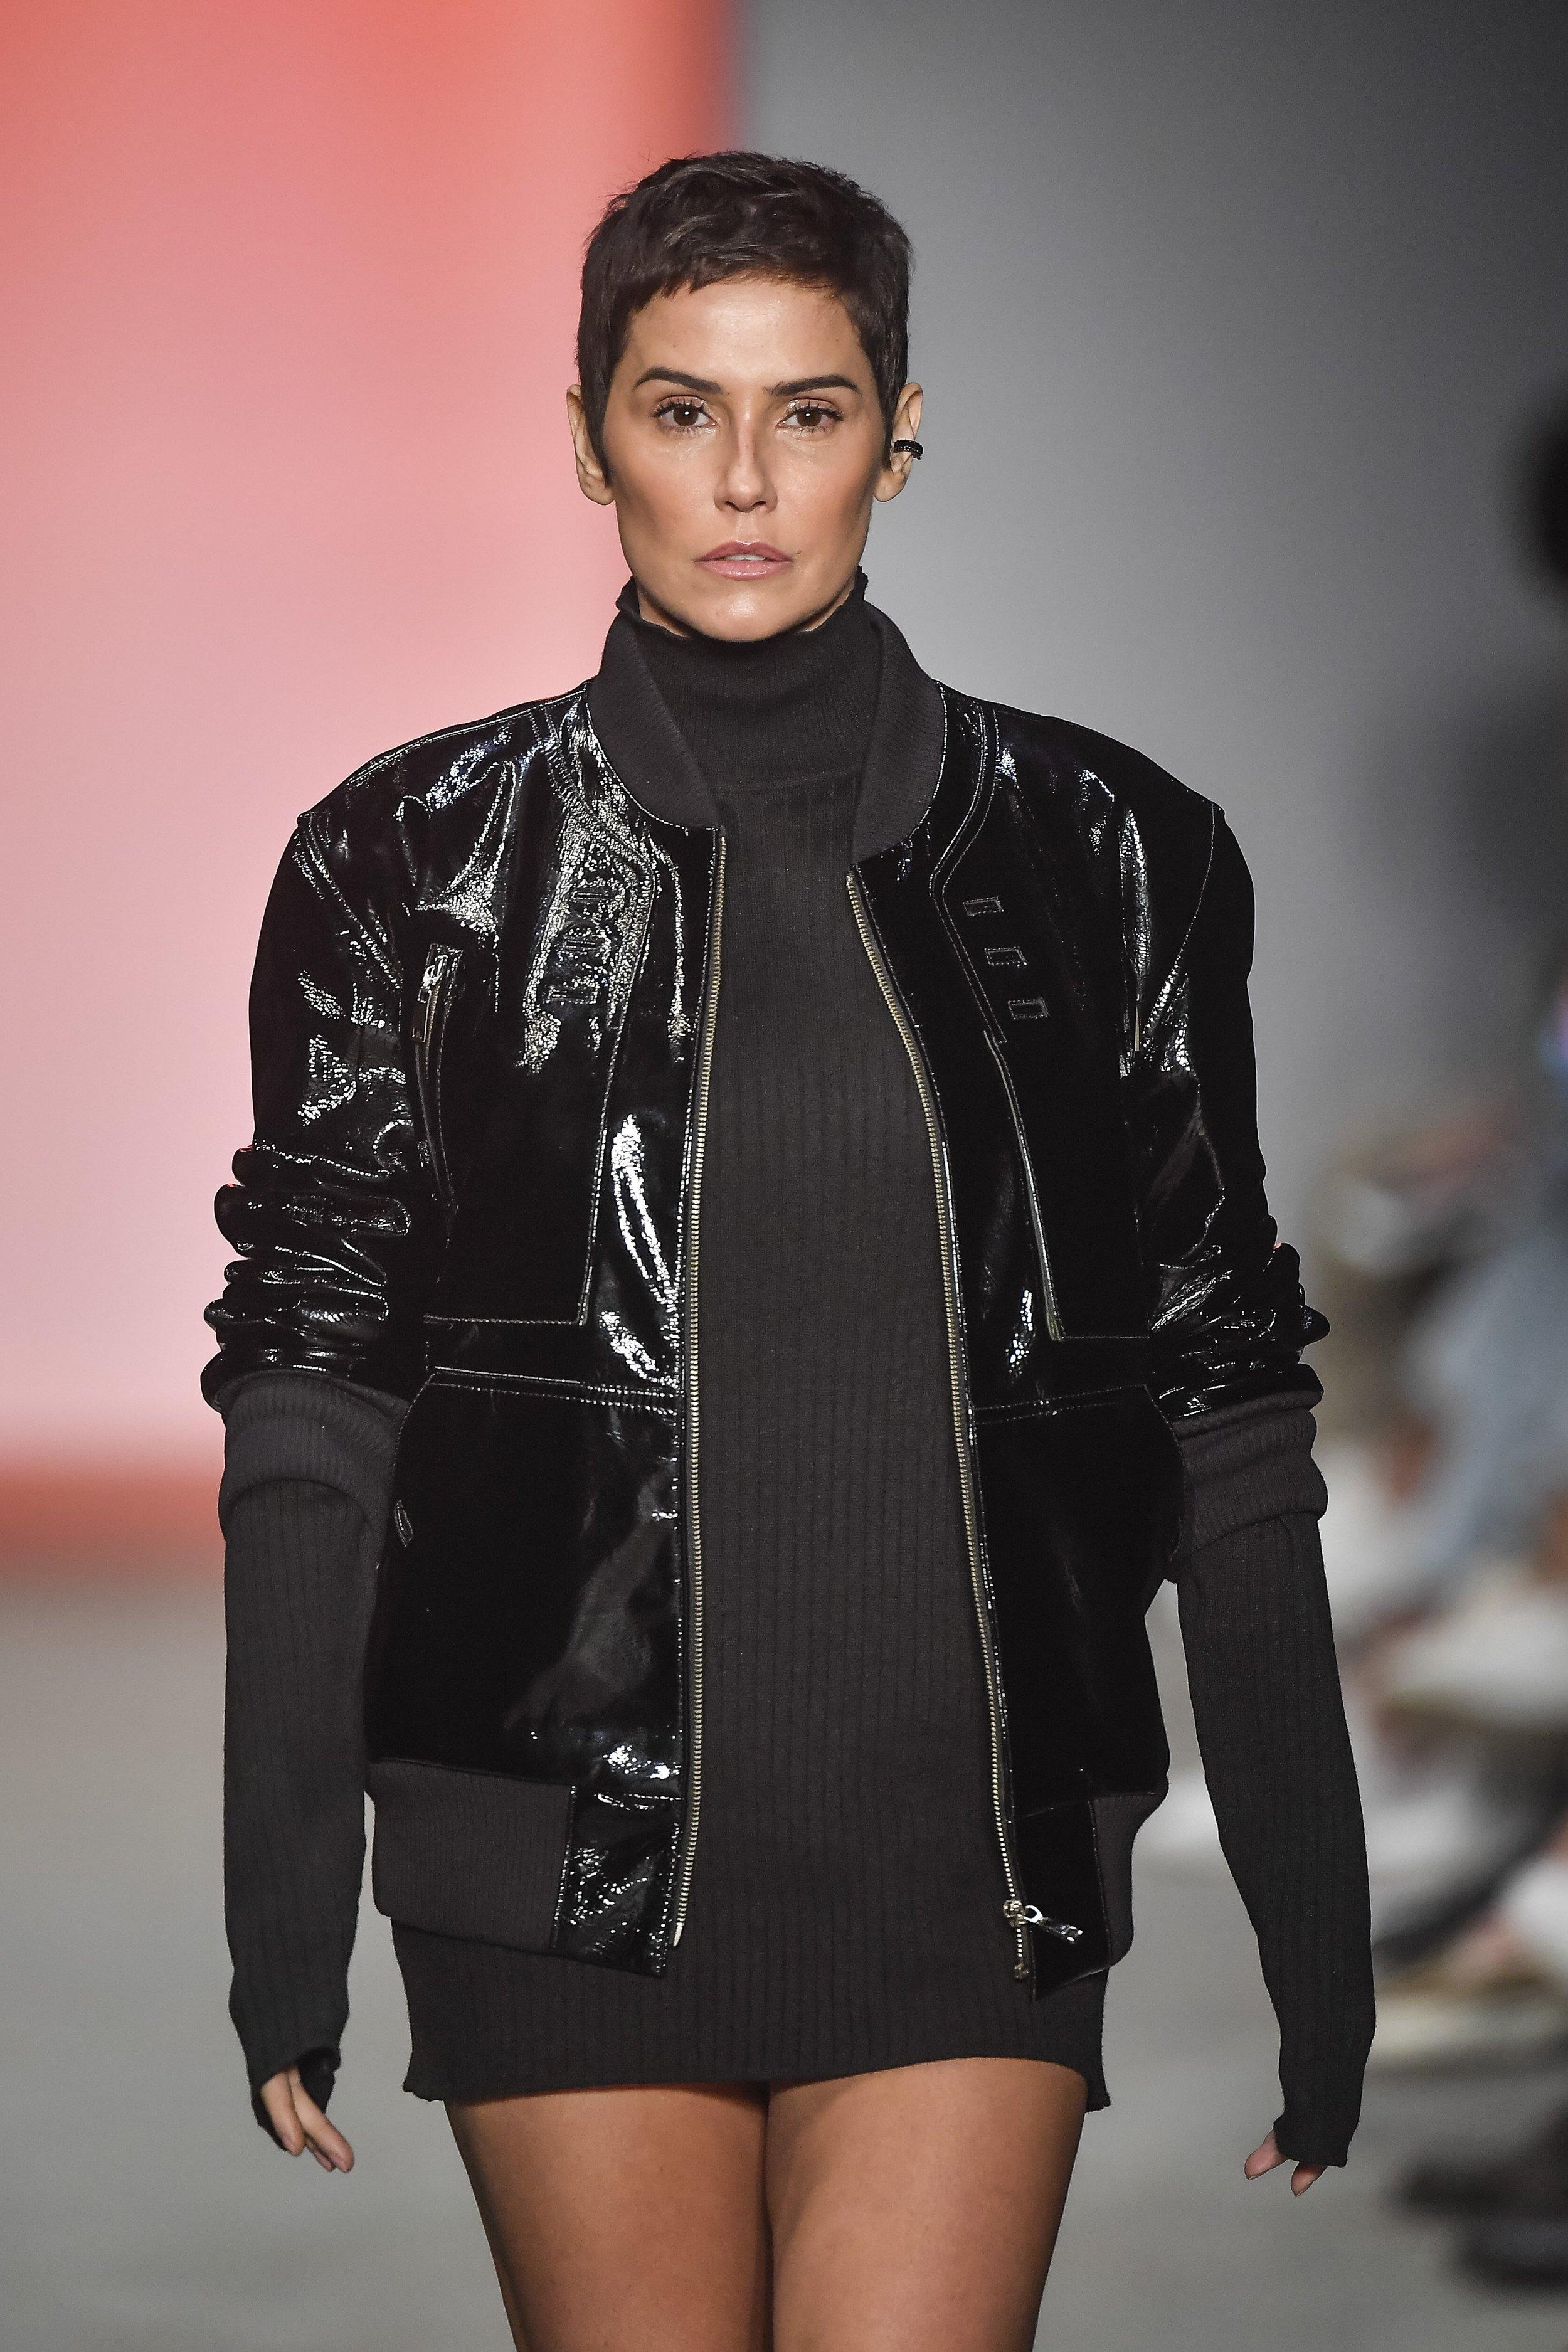 Actress Deborah Secco walked the runway for Torinno / Photo: Marcelo Soubhia.